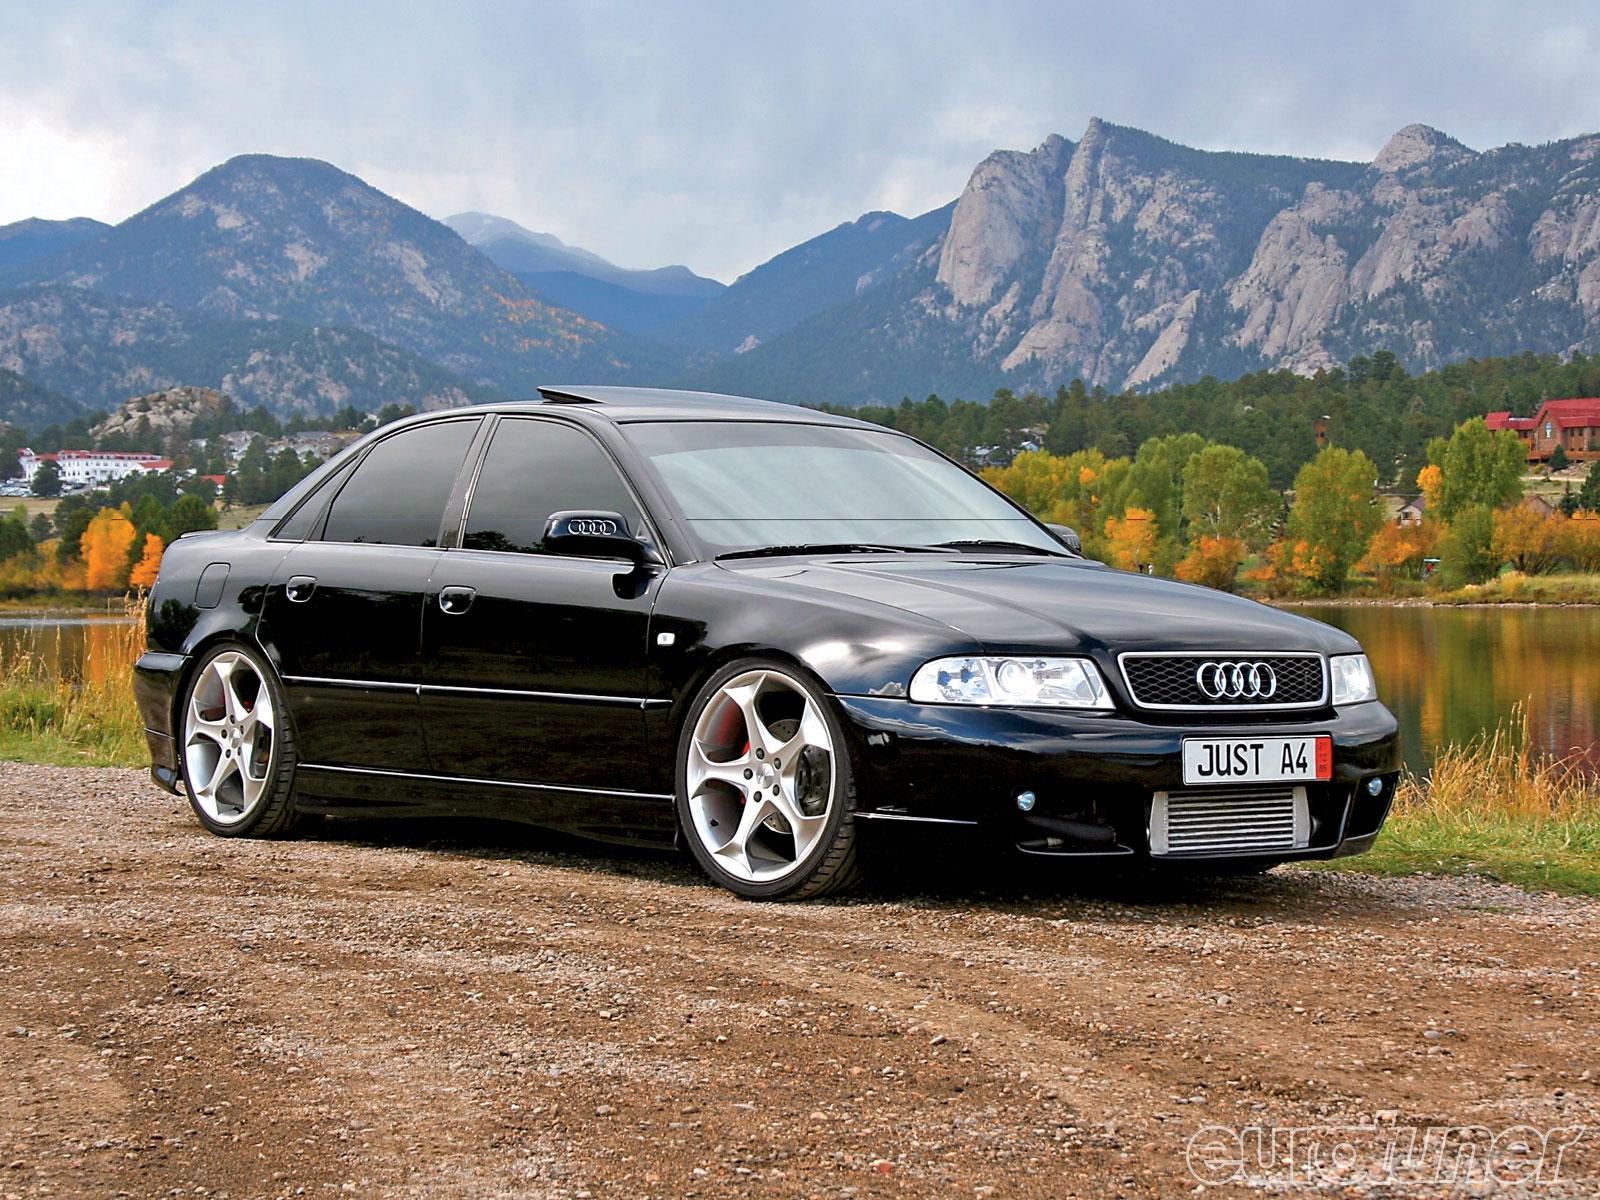 2000 Audi A4 Image 9